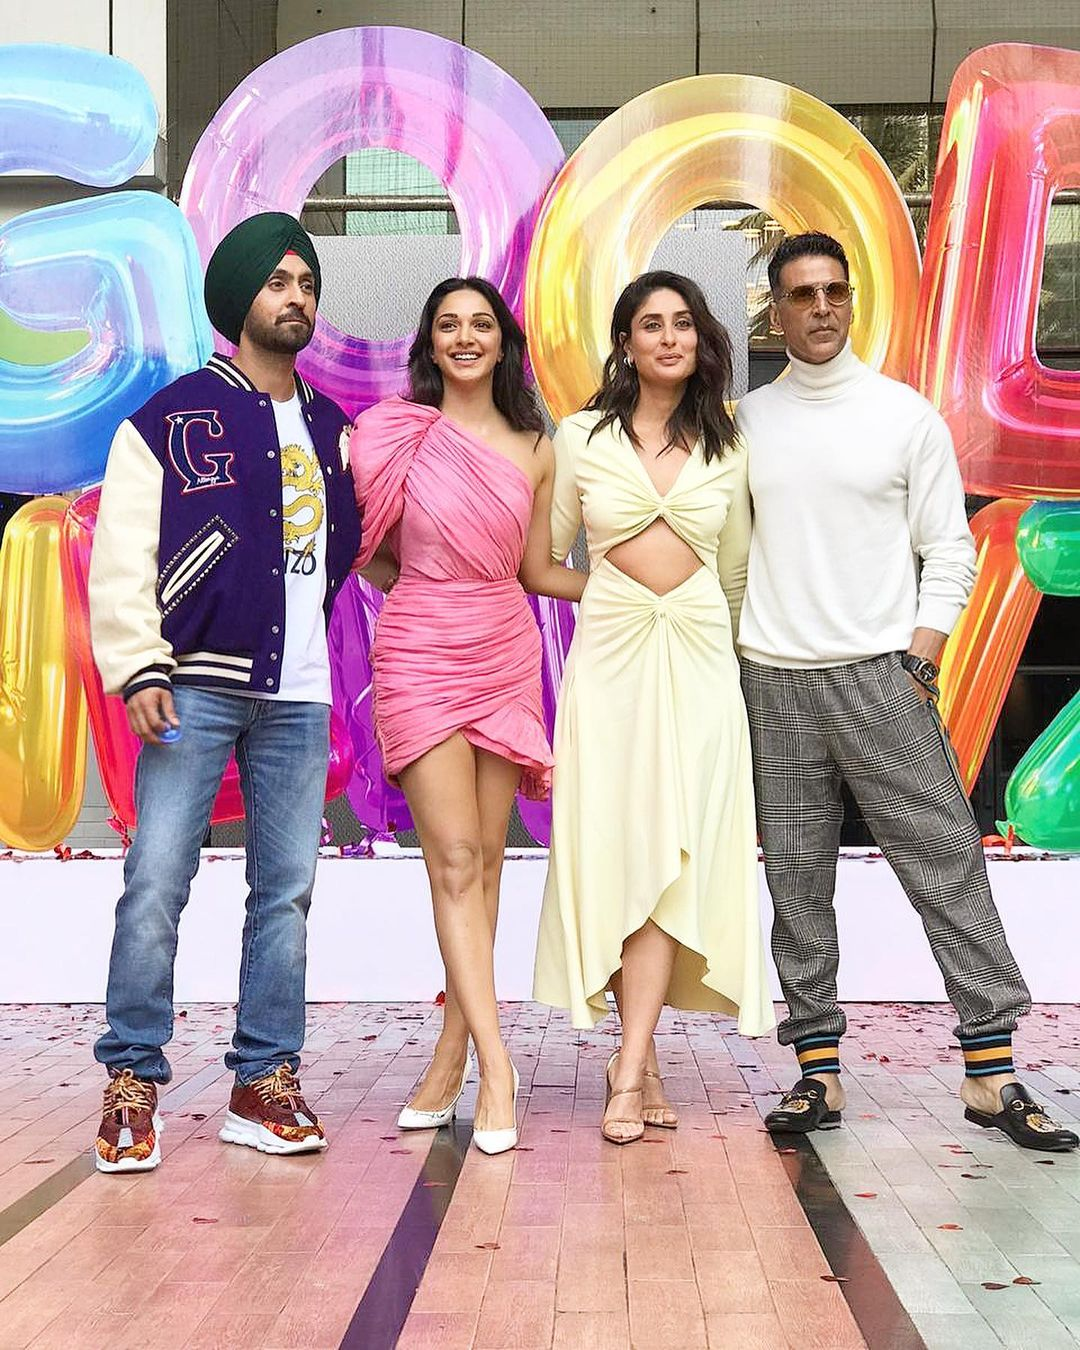 kiara advani with diljit dosanjh, Kareena Kapoor, akshay kumar